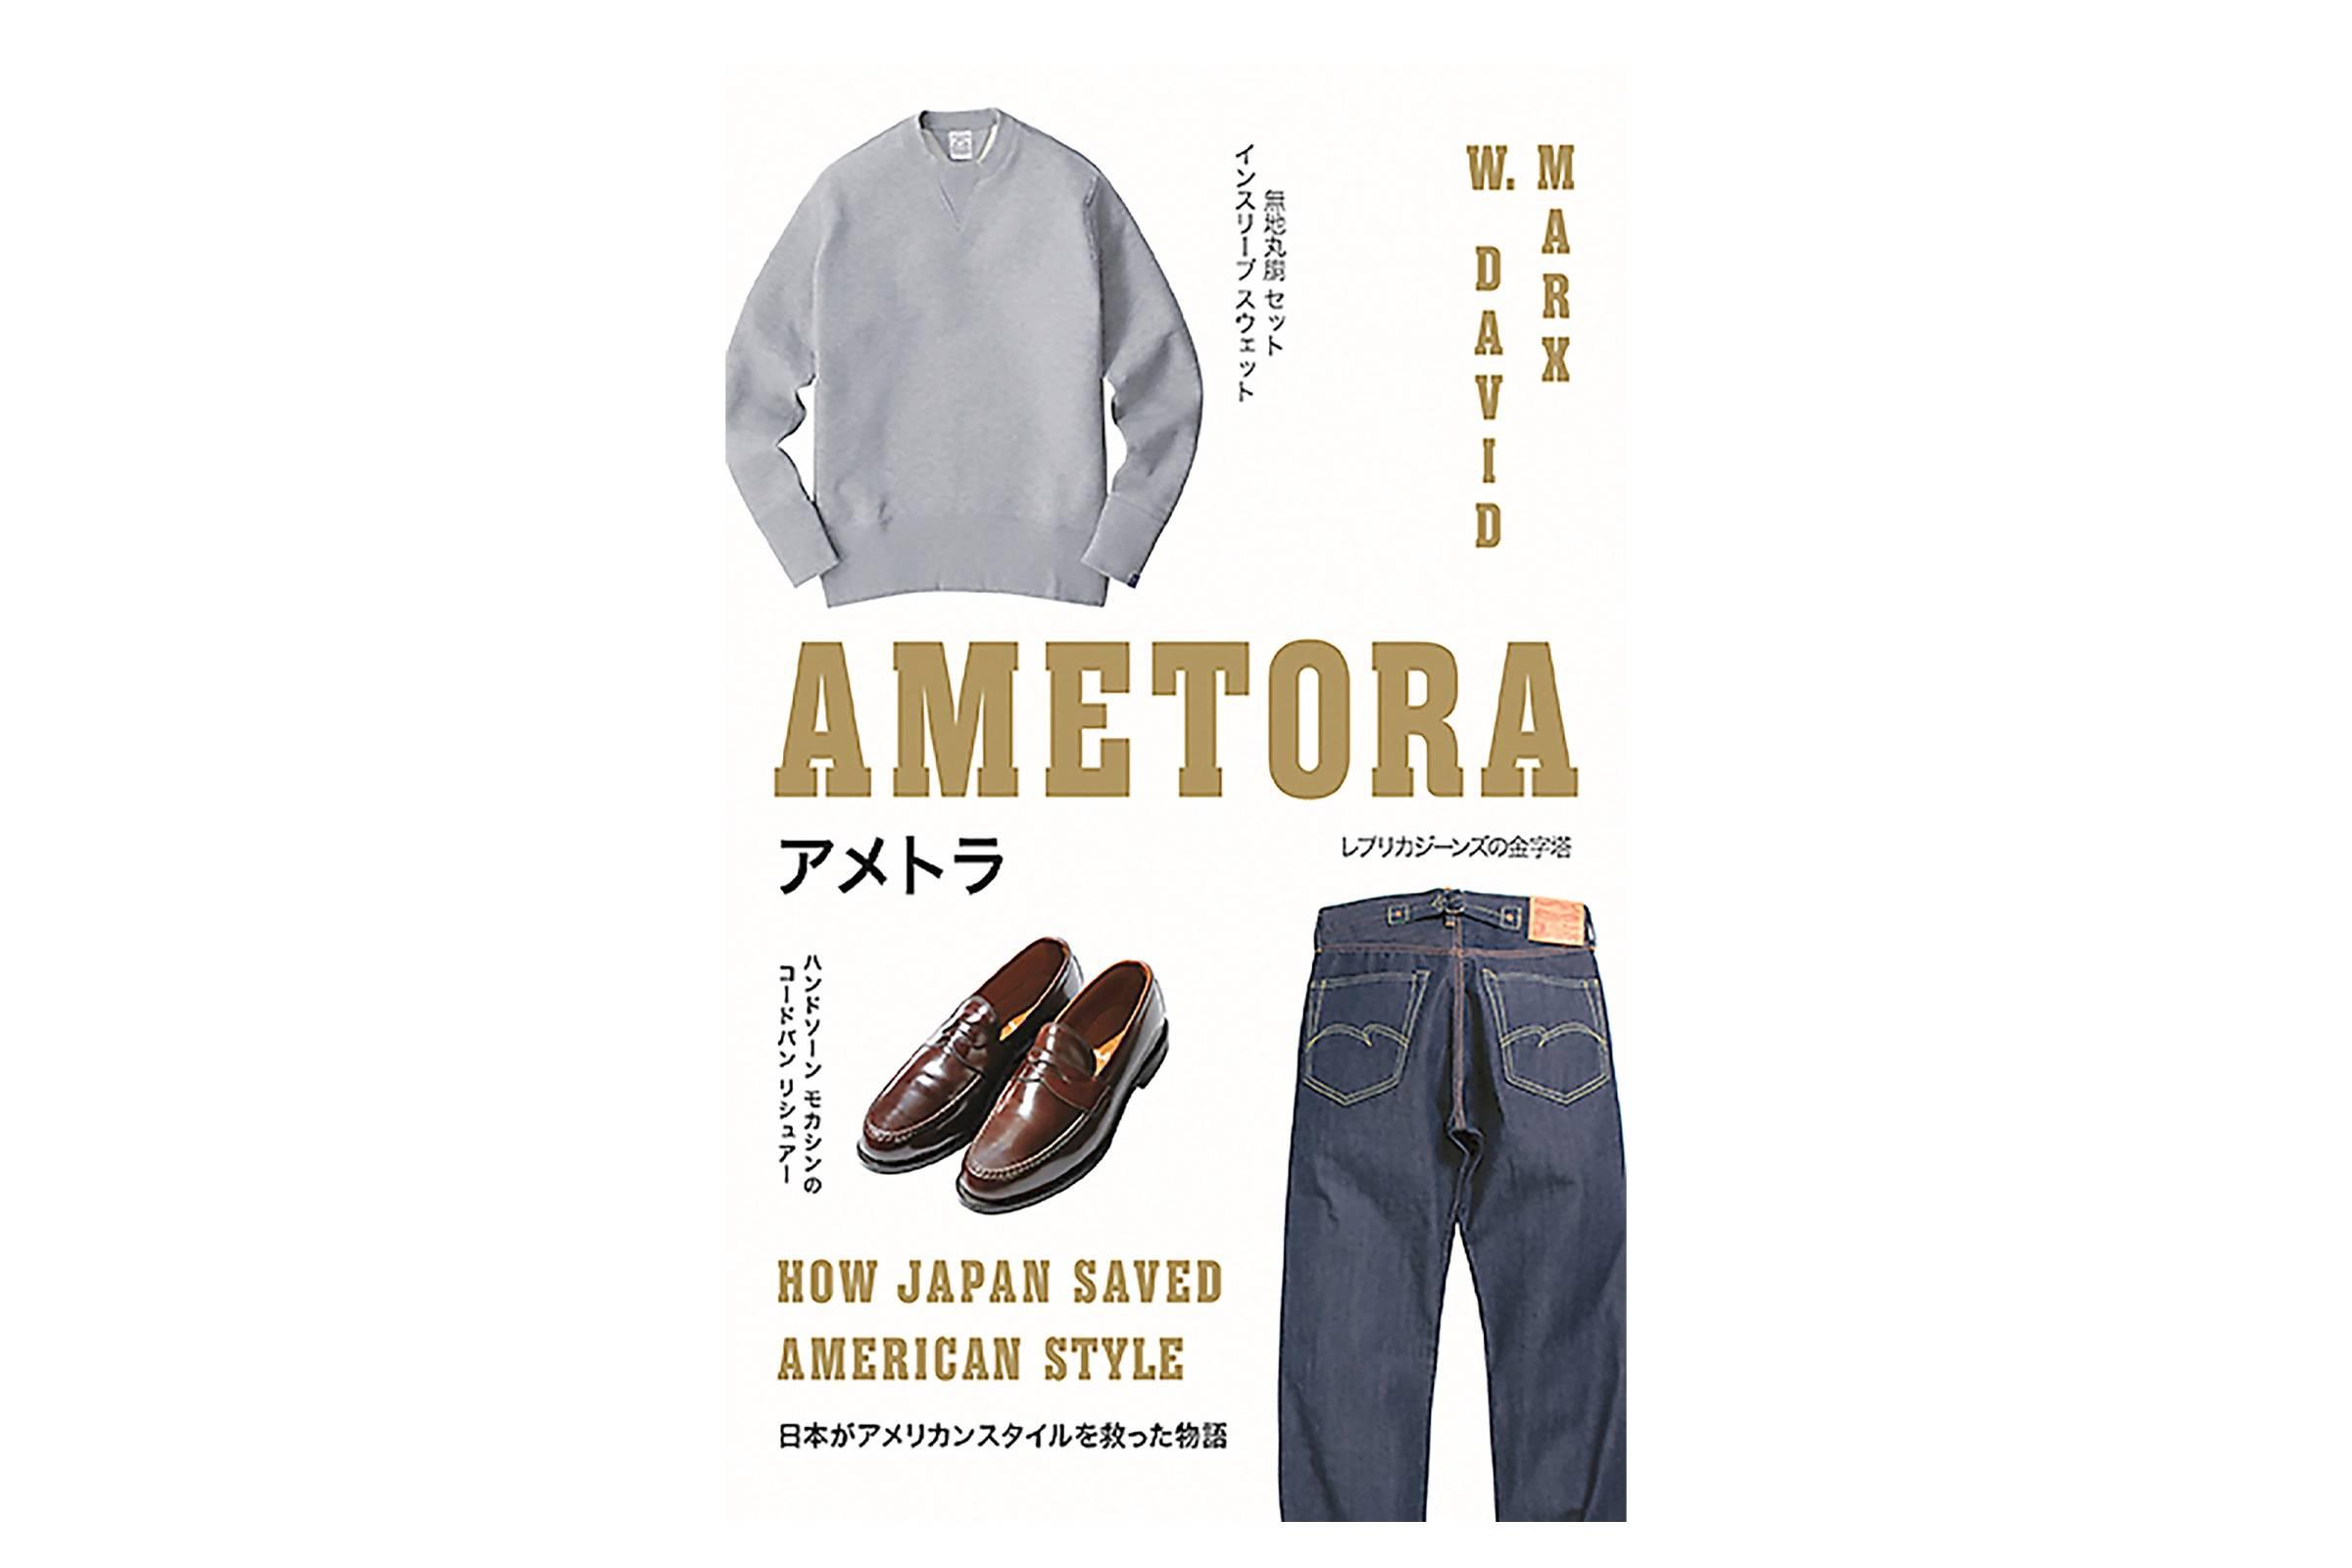 """Ametora: How Japan Saved American Style"" (2015)"